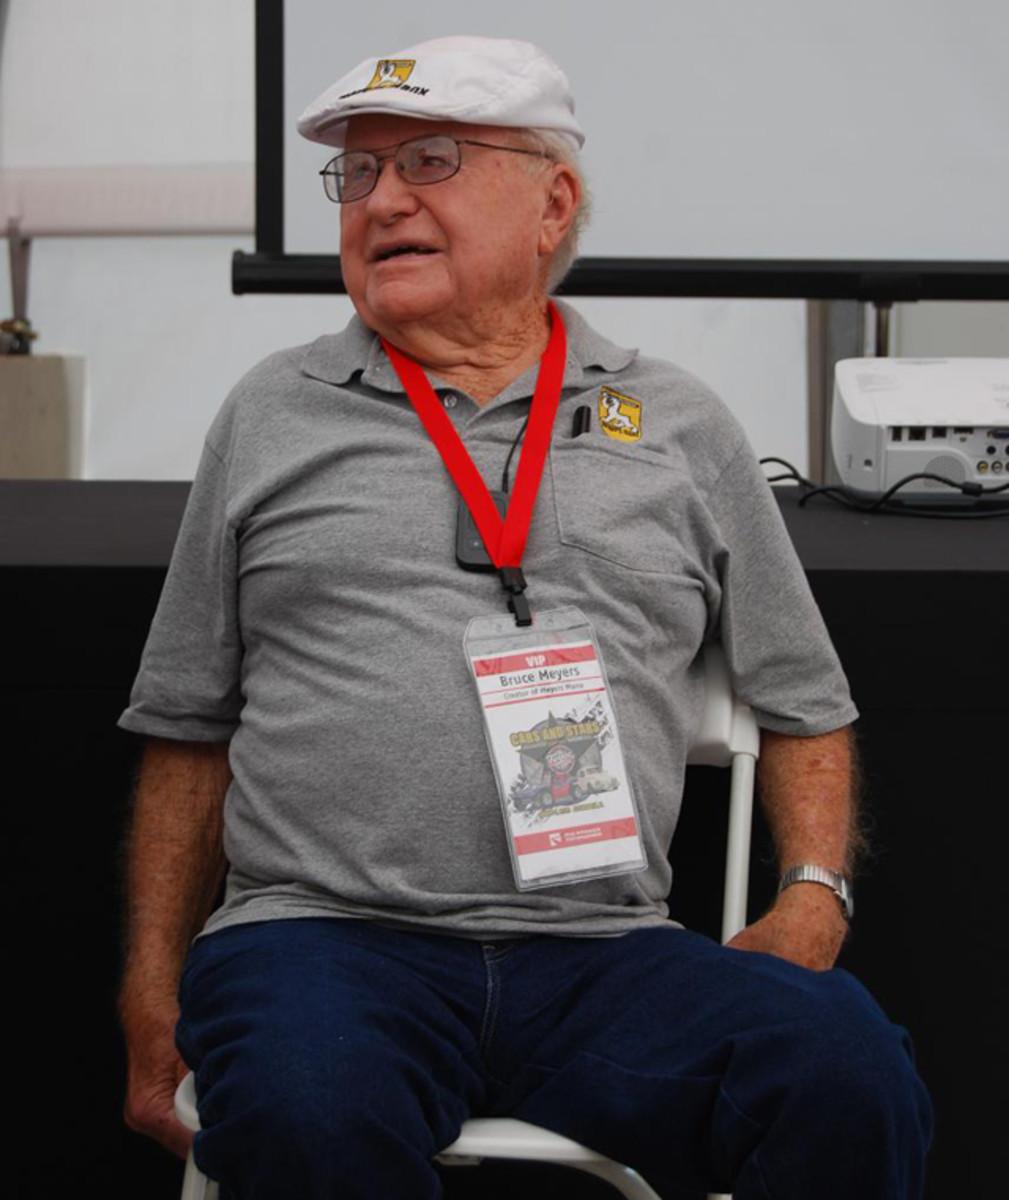 Bruce Meyers created the dune buggy.